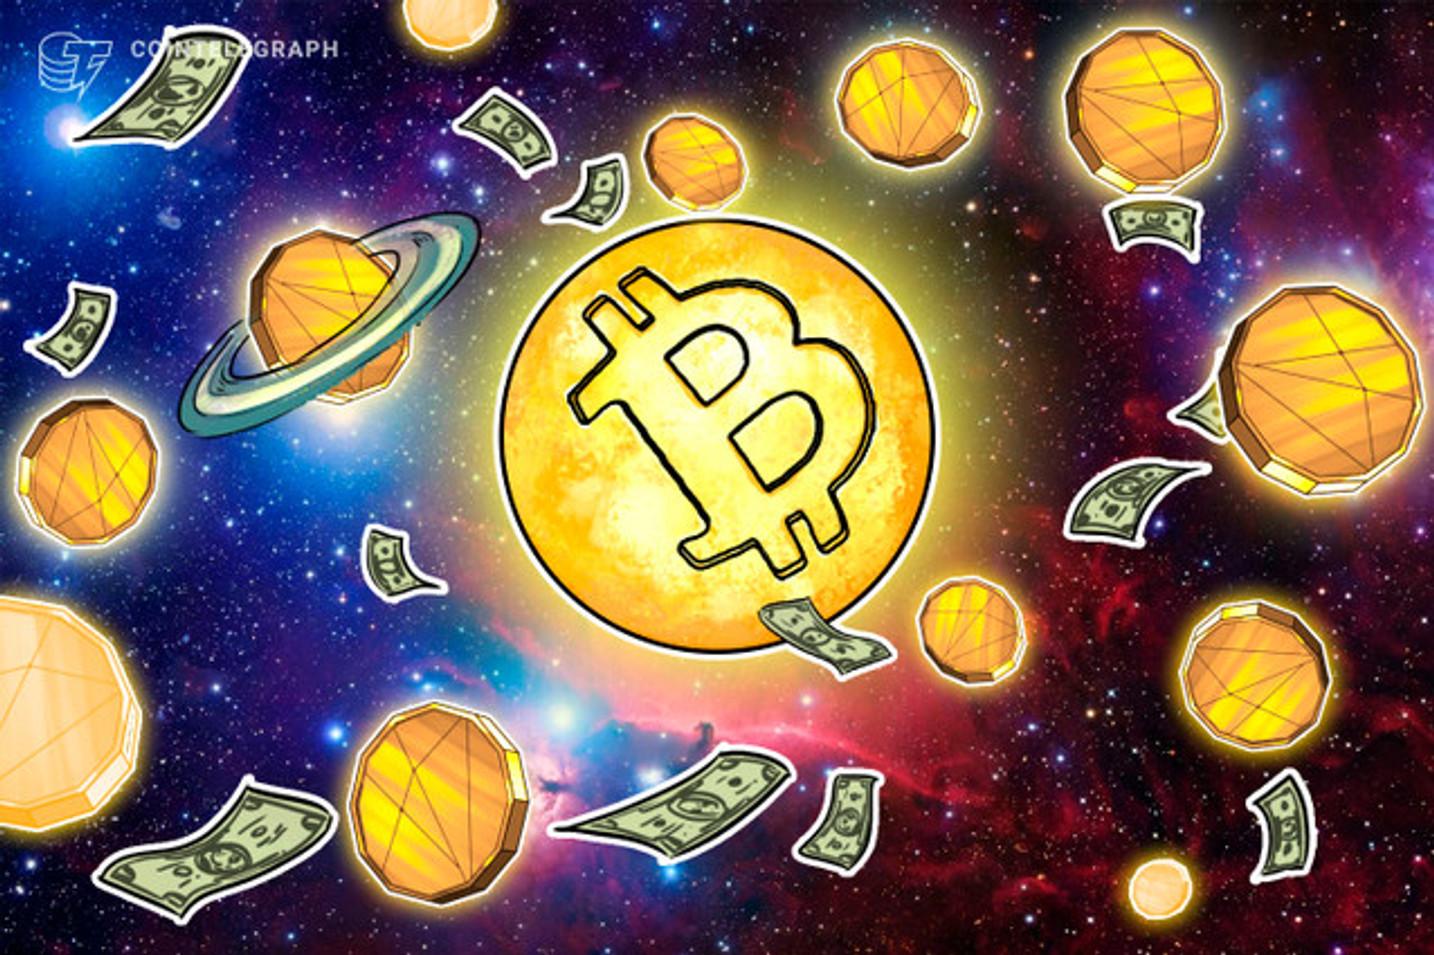 El volumen de comercio de Bitcoin cae un 37% a nivel mundial, pero aumenta en América Latina